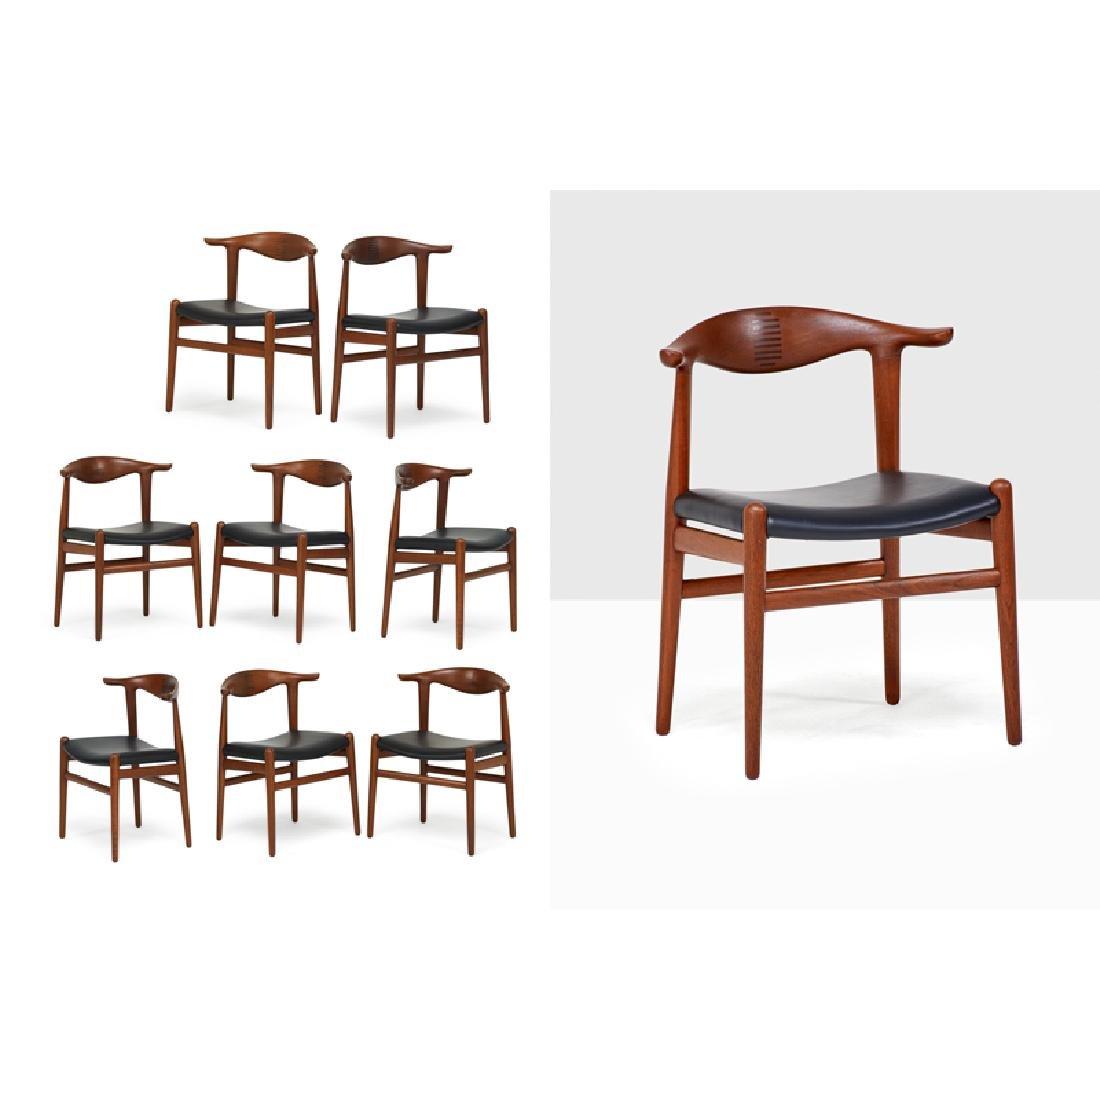 HANS WEGNER Set of eight Cowhorn chairs